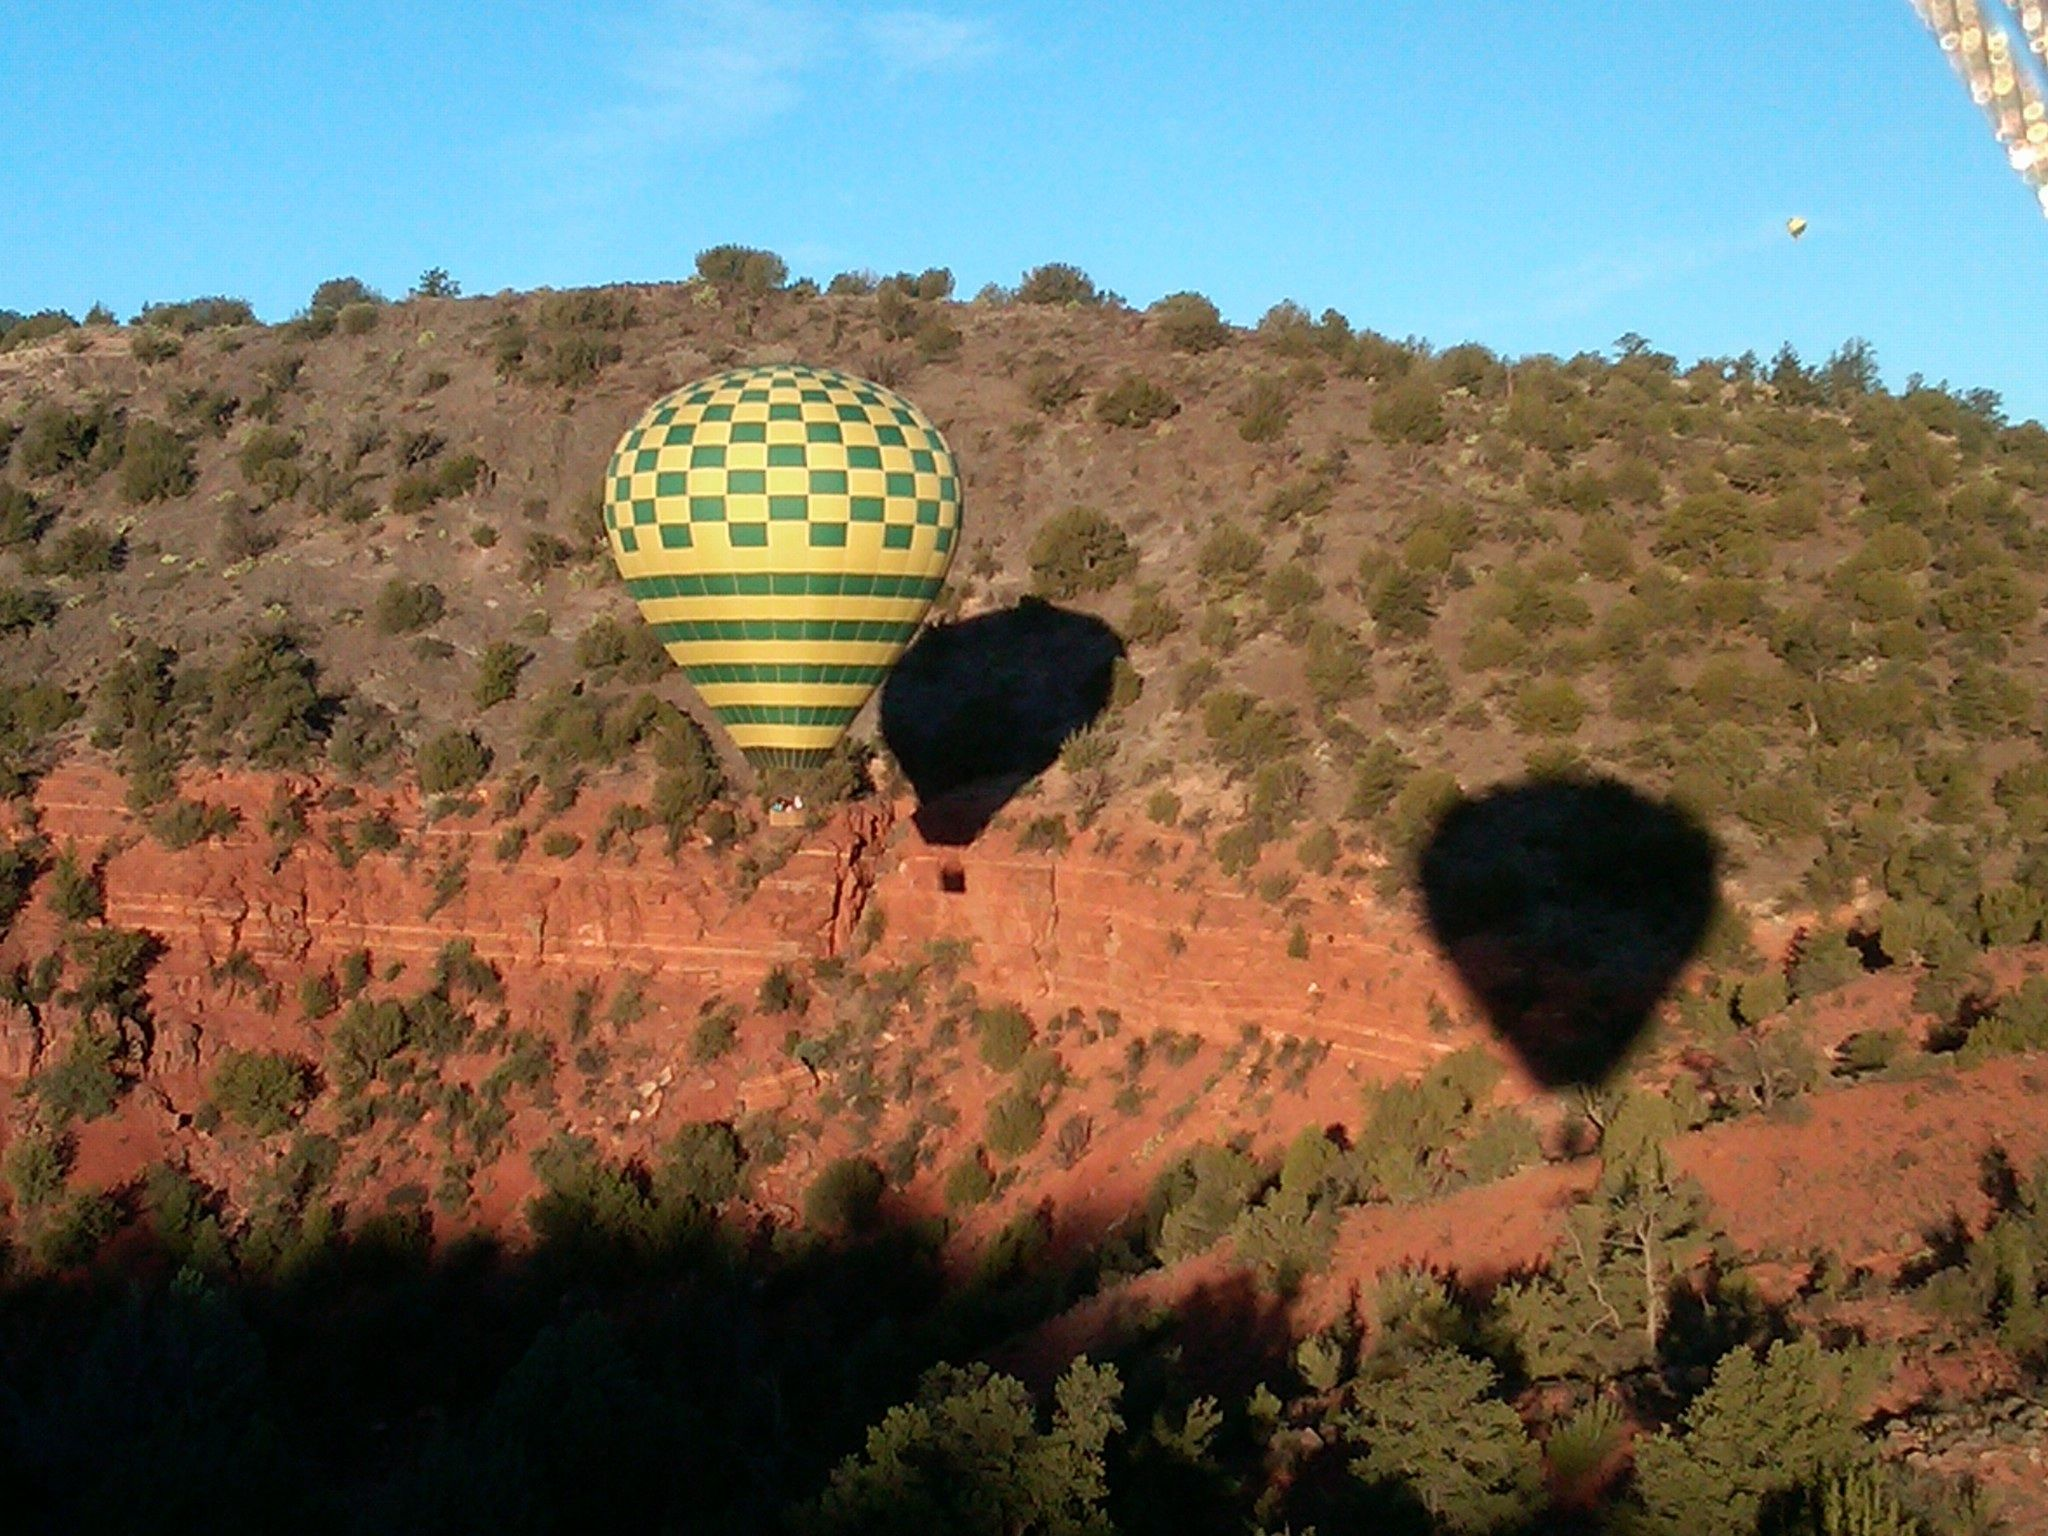 Northern Lights Hot Air Balloon Ride in Sedona AZ